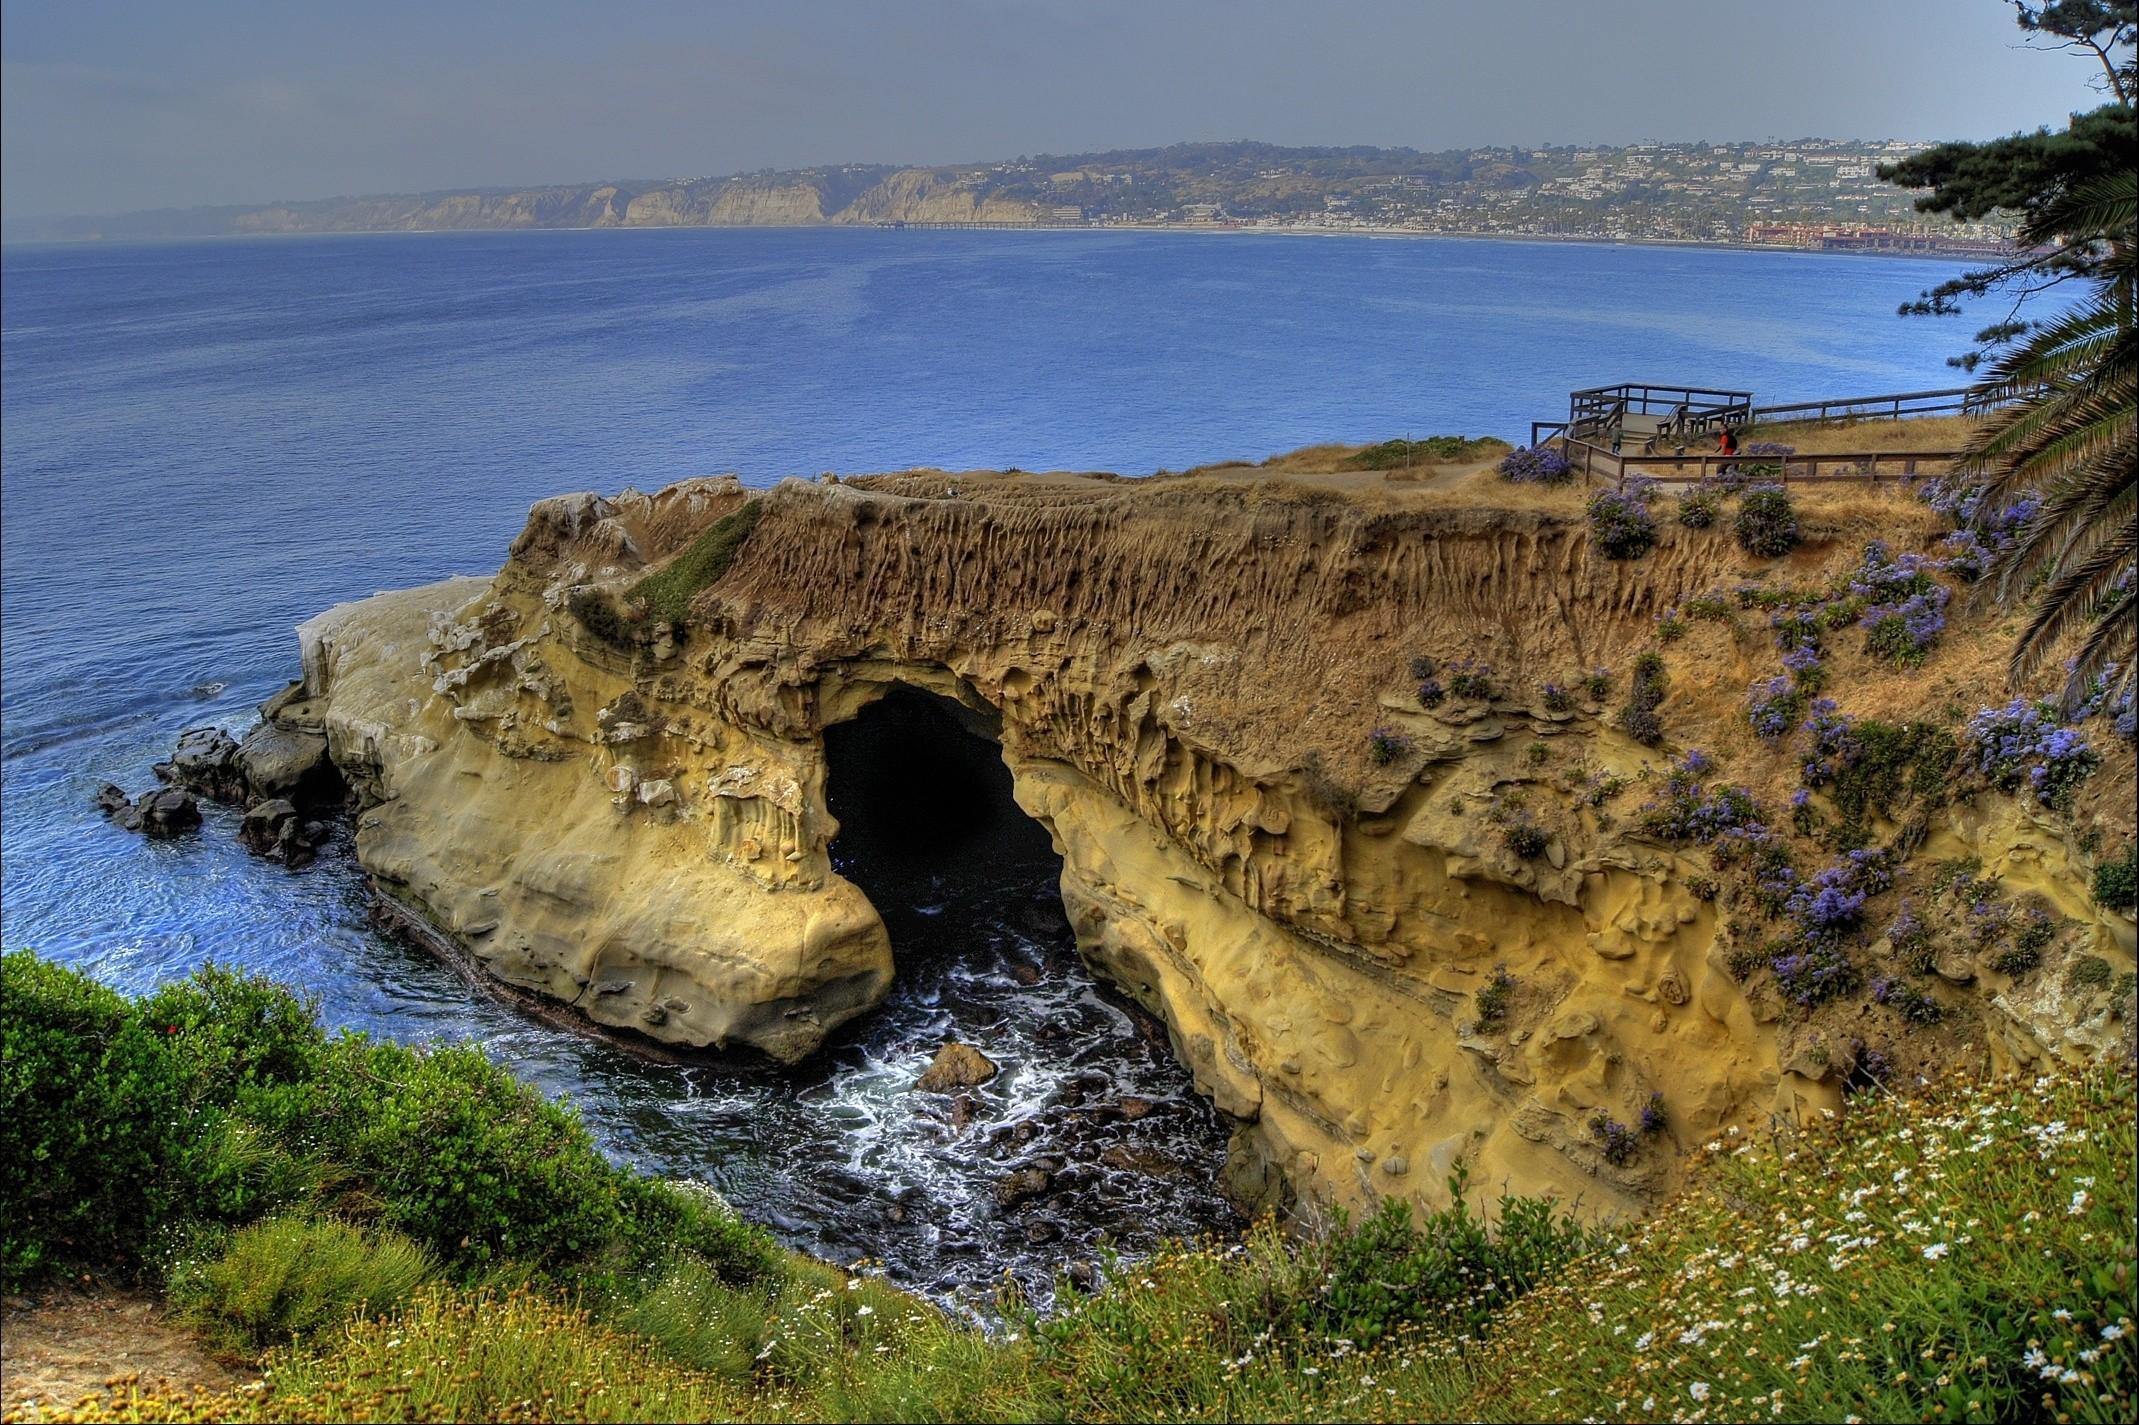 California La Jolla Usa Nature Wallpaper 102774 2139x1425